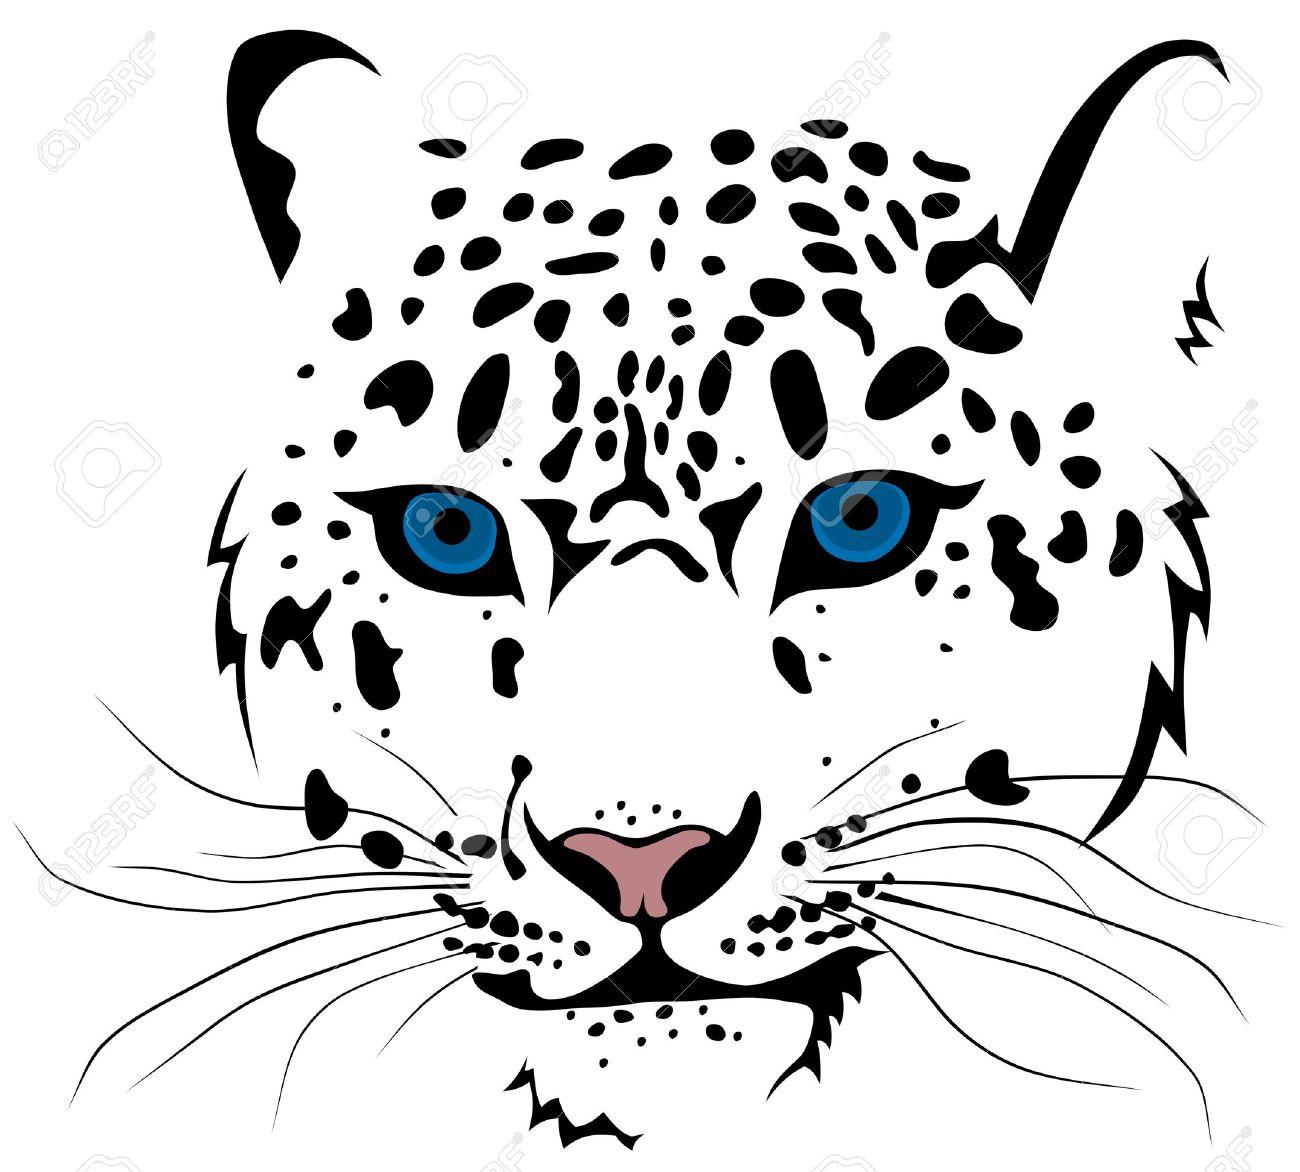 abstract vector illustration of snow leopard bars royalty free rh 123rf com Snow Leopard Cartoon snow leopard images clip art